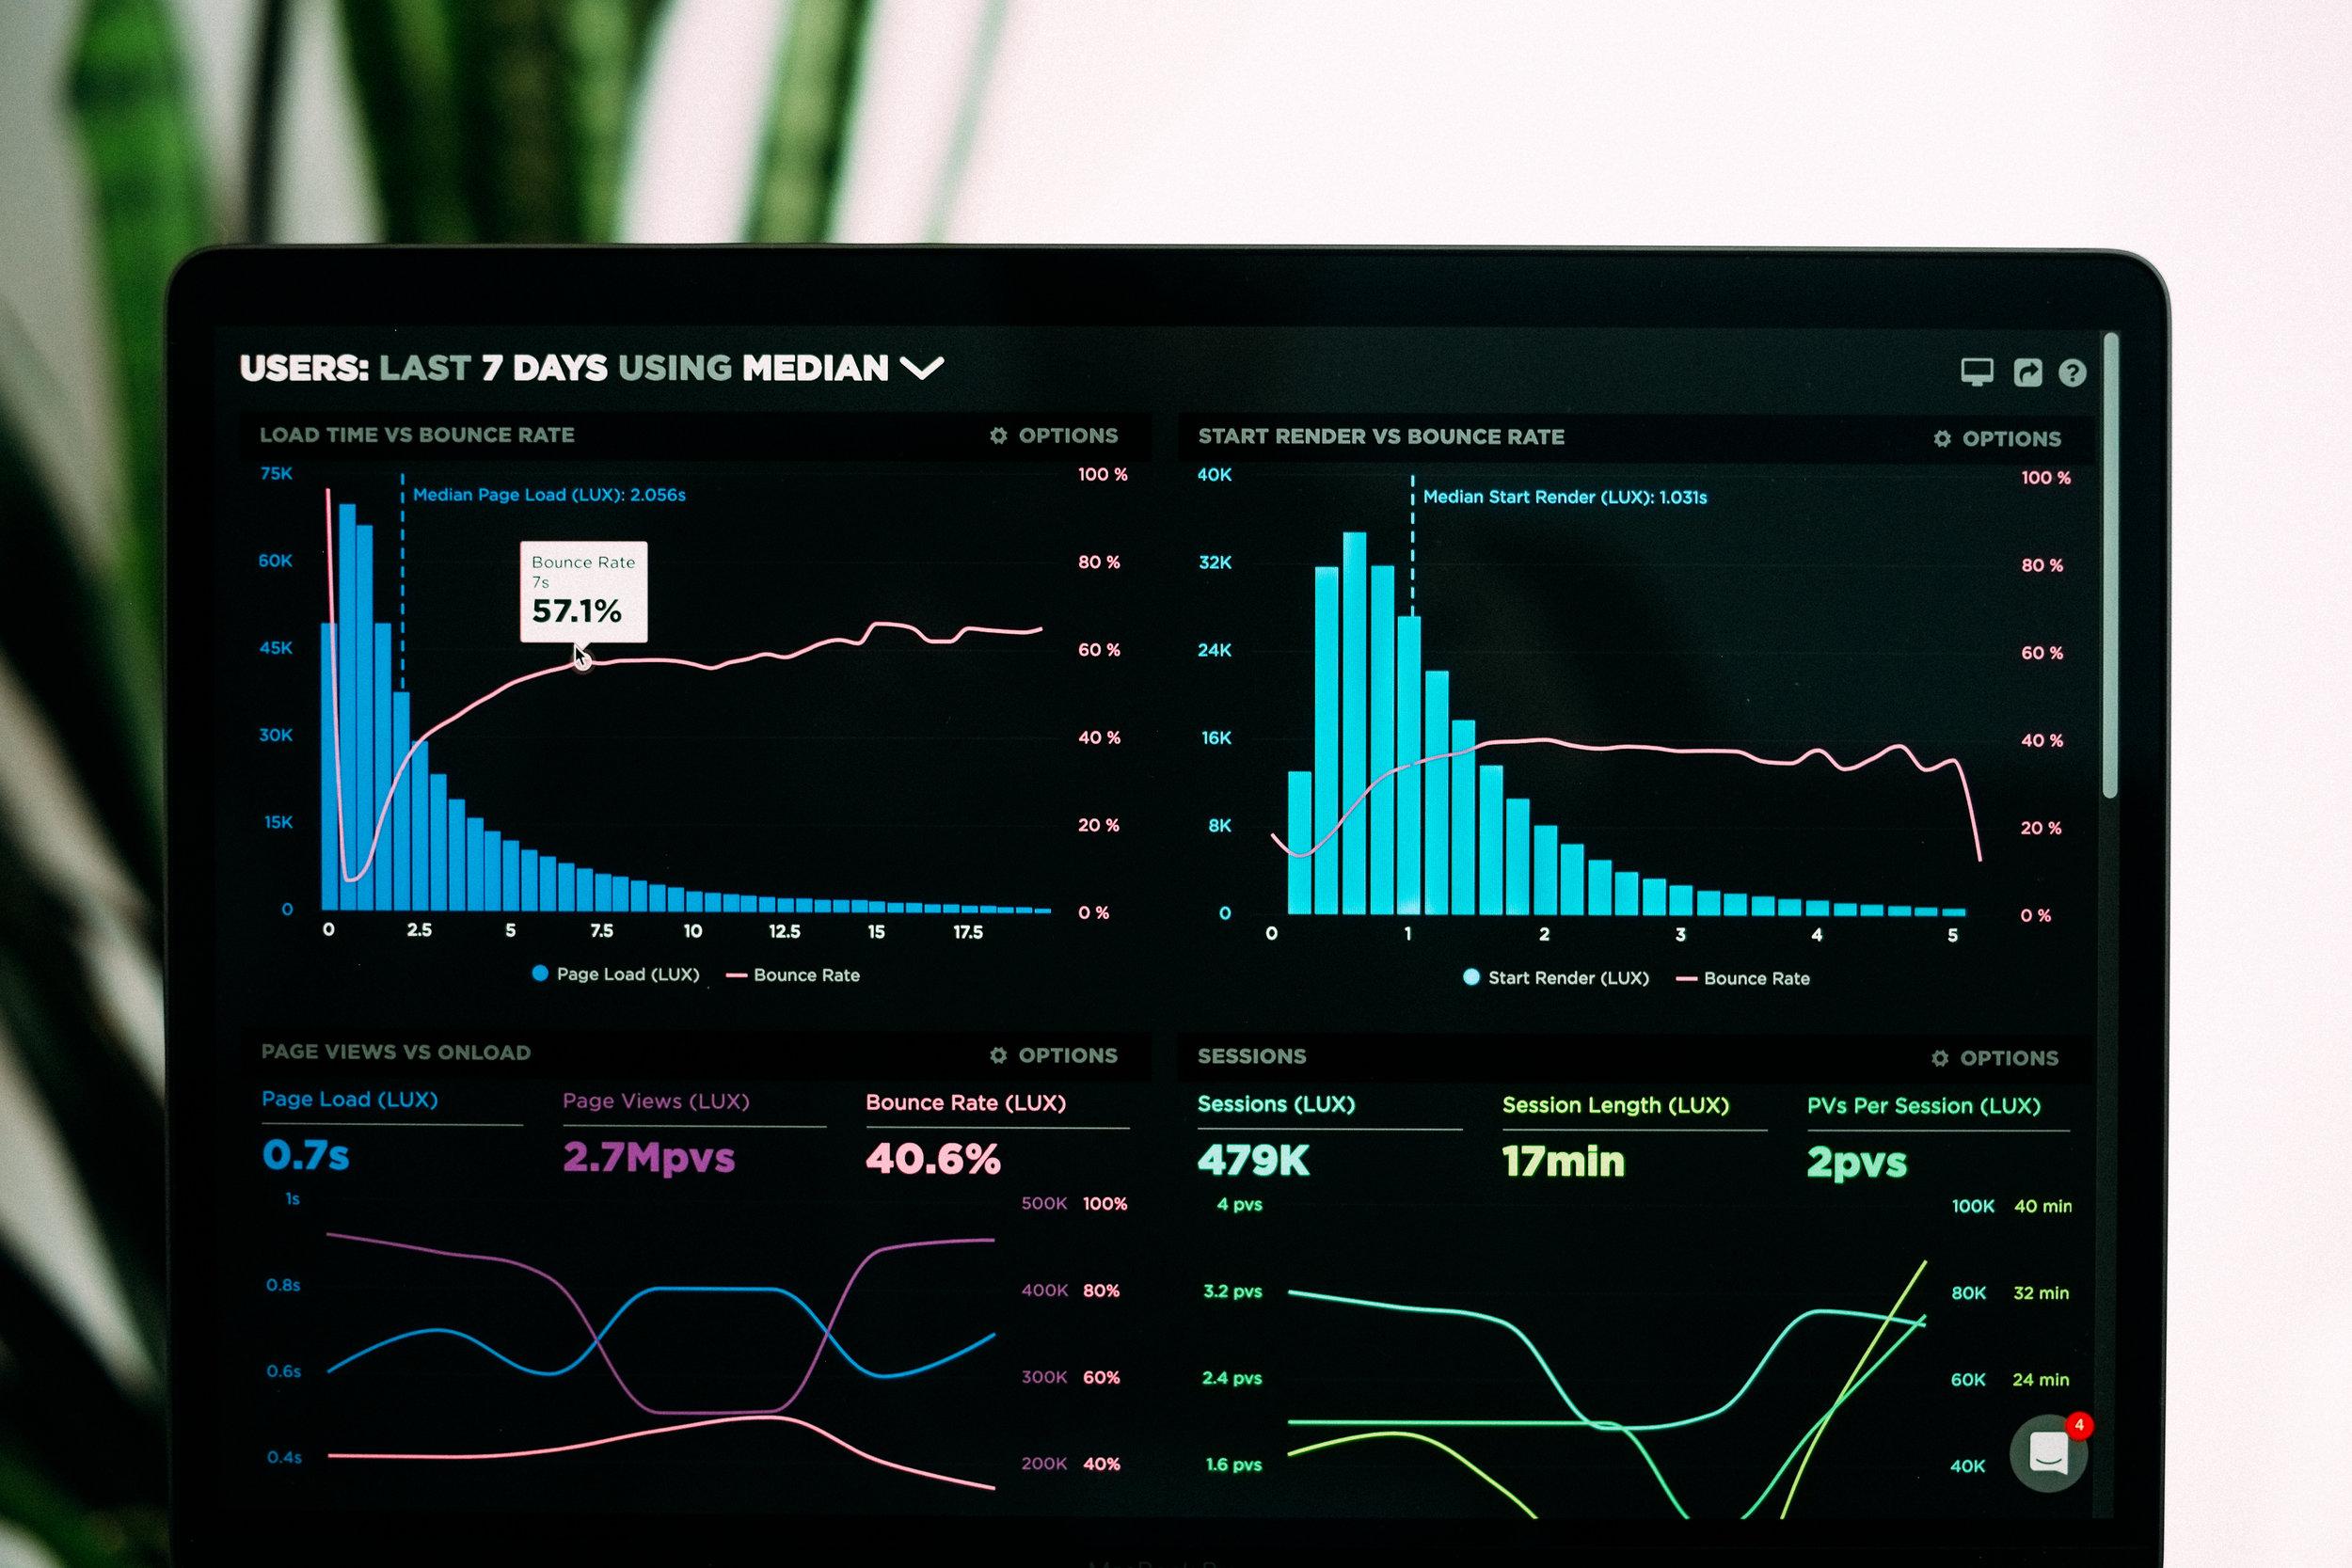 Sync Digital Solutions - Network Growth on Instagram, LinkedIn, Facebook